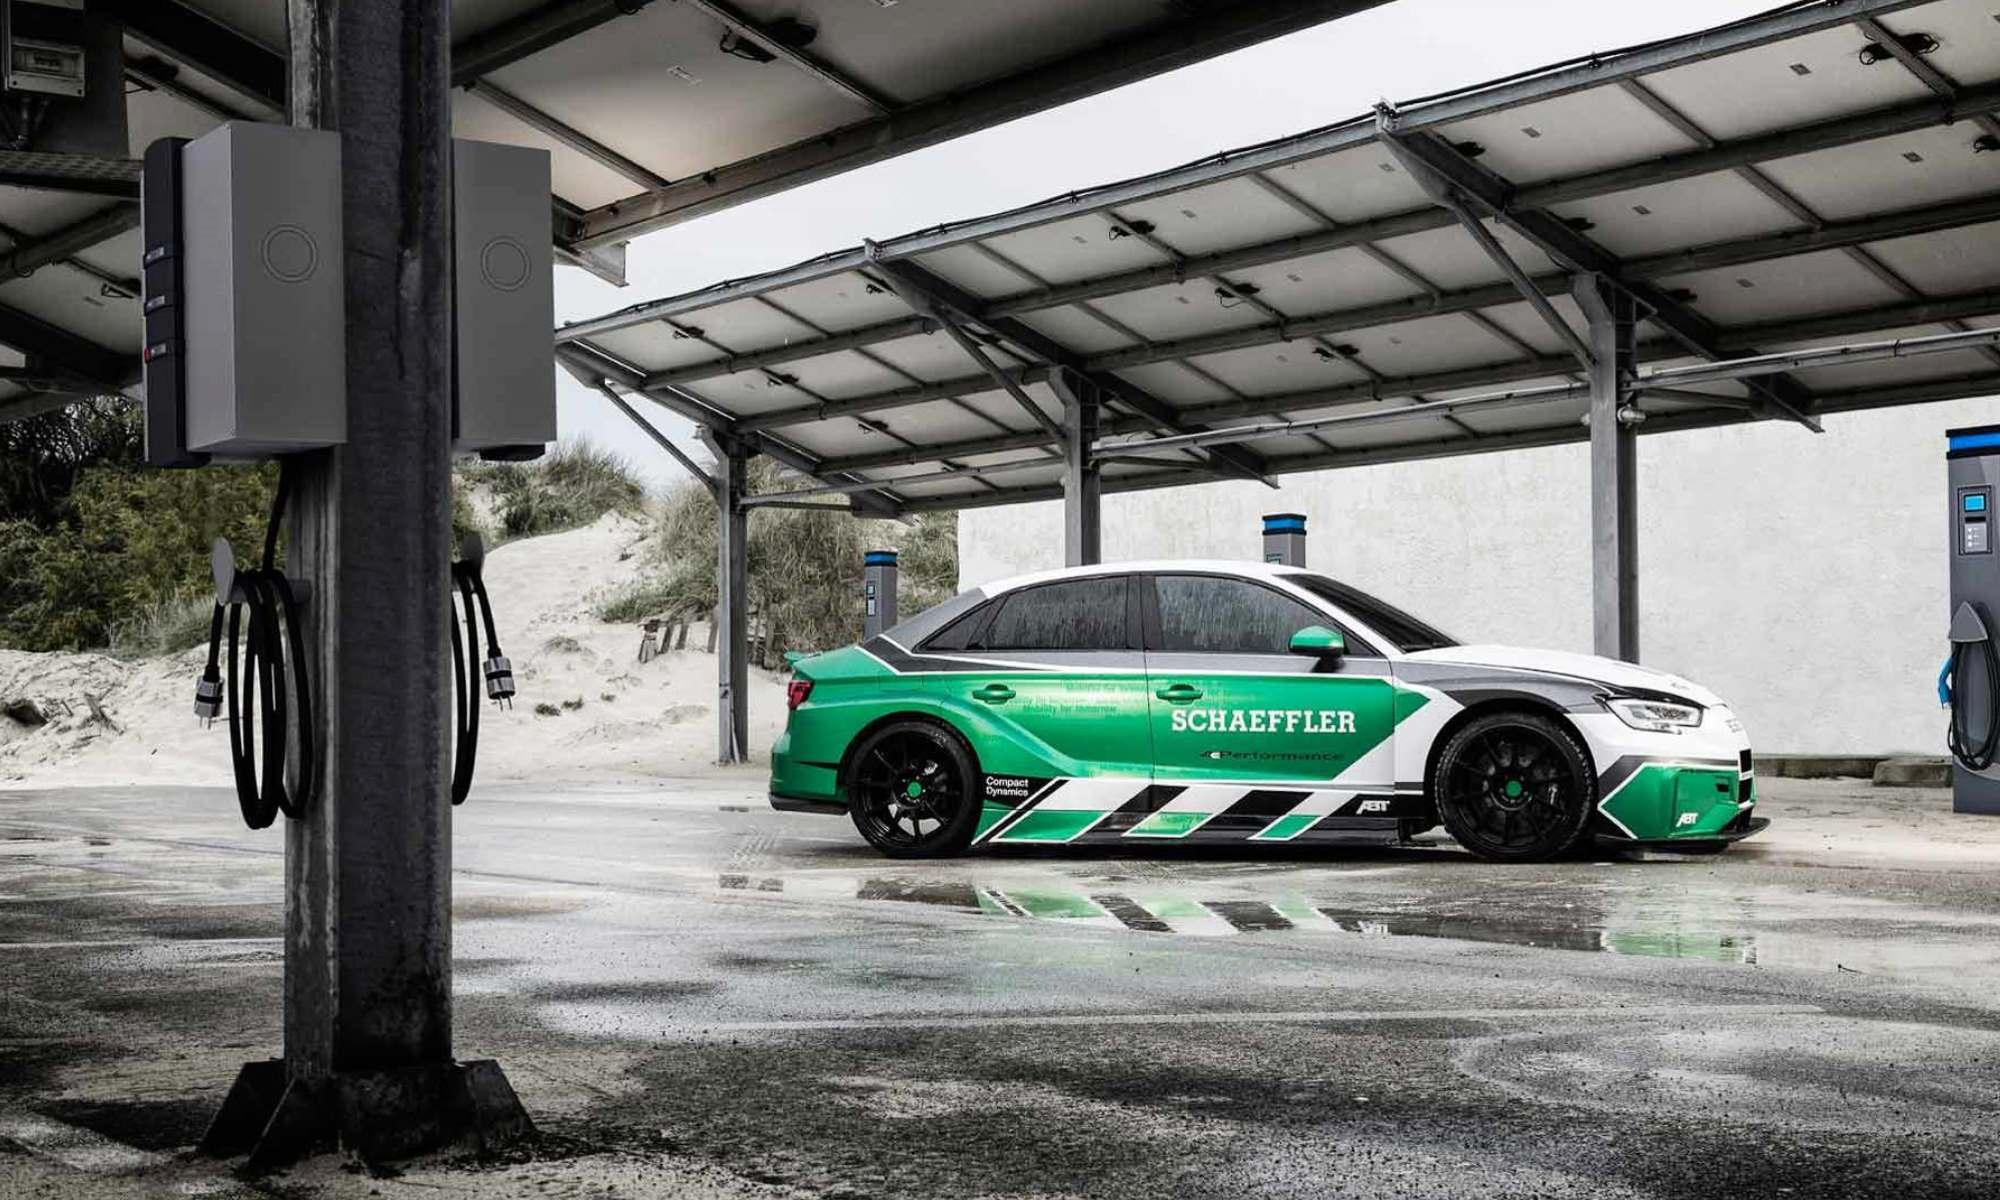 Audi 4e Performance Concept